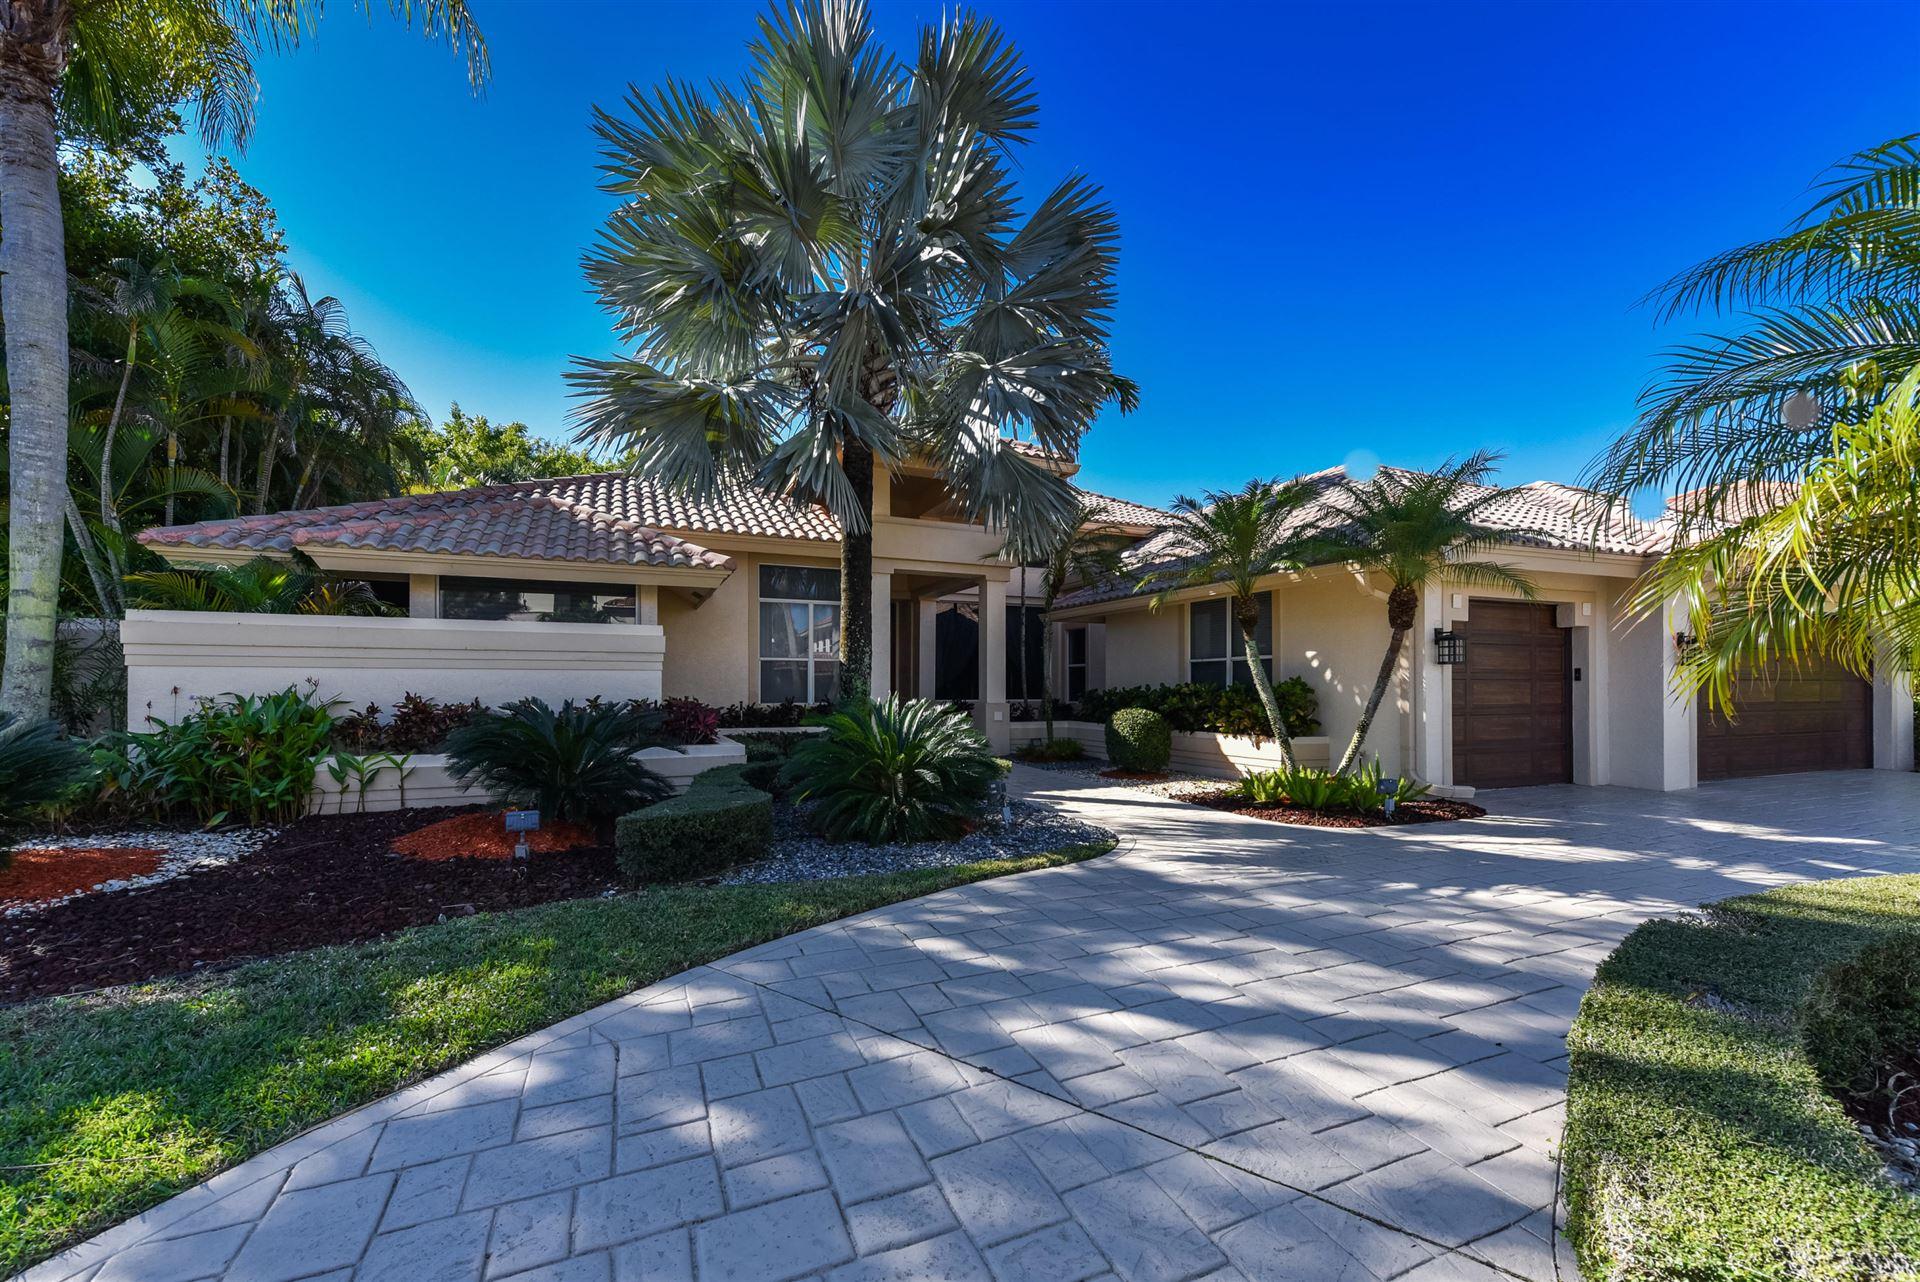 3954 NW 52nd Street, Boca Raton, FL 33496 - #: RX-10599801